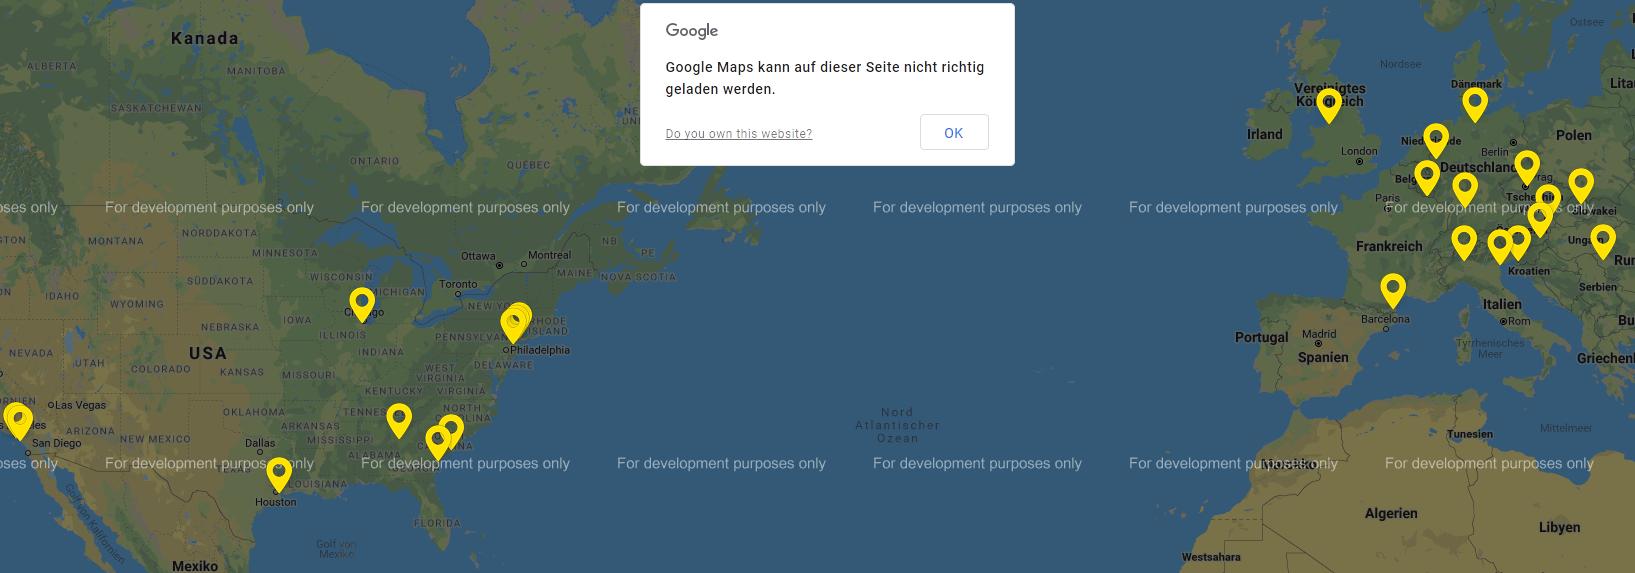 Google Maps - Internetagentur Powerflash on